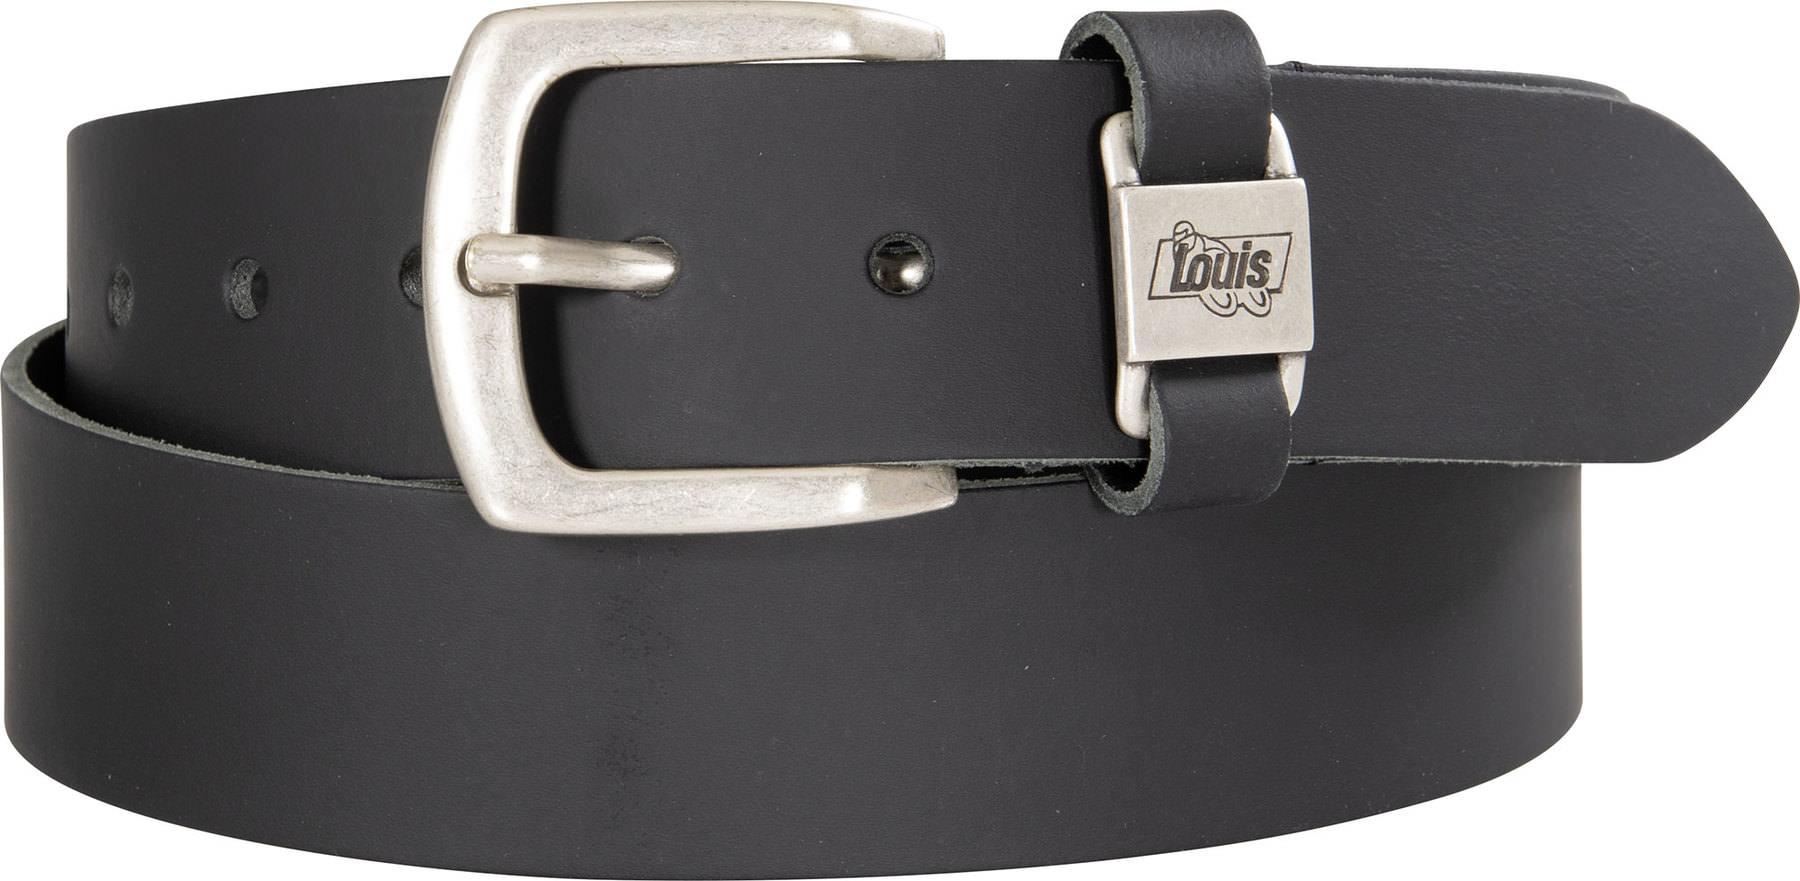 Gürtel  Reperaturset  FÜR LEDERGÜRTEL aus  Leder für Gürtel vom 3 bis 4 cm.breit